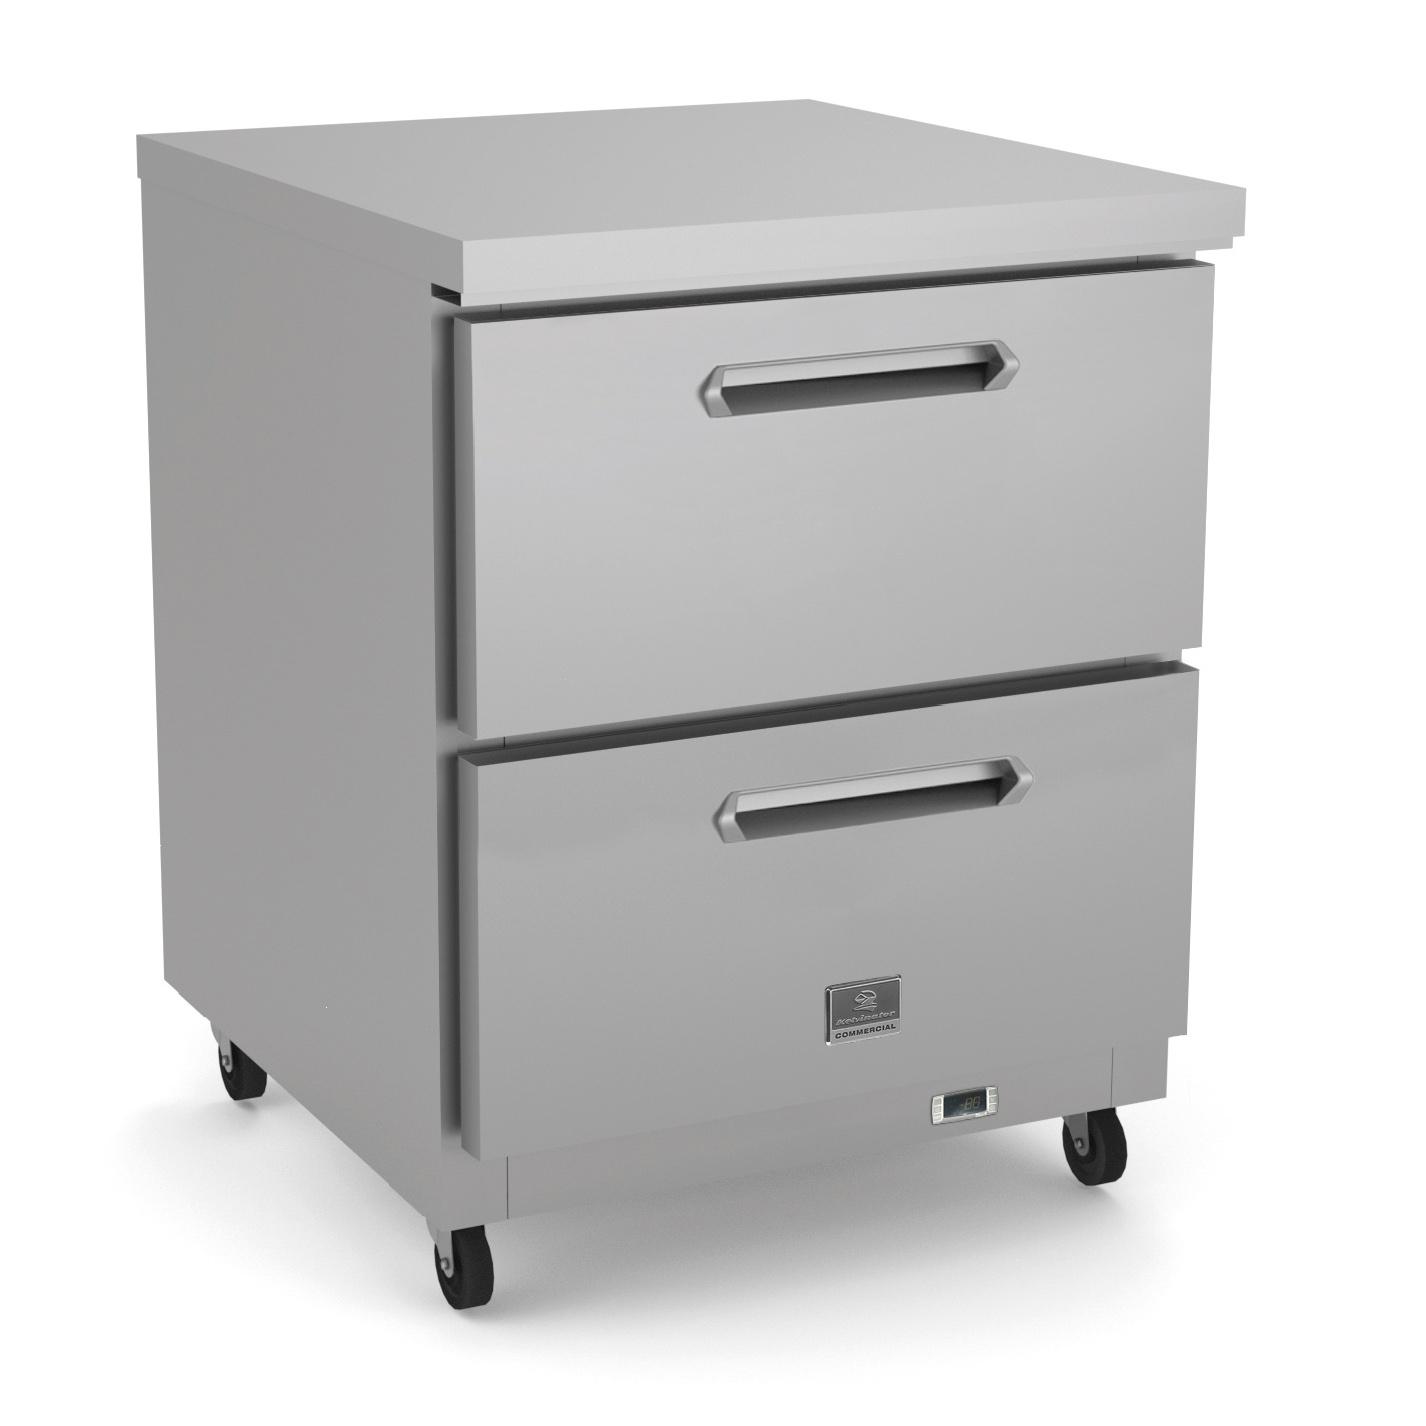 Kelvinator Commercial KCHUC27R.2D refrigerator, undercounter, reach-in